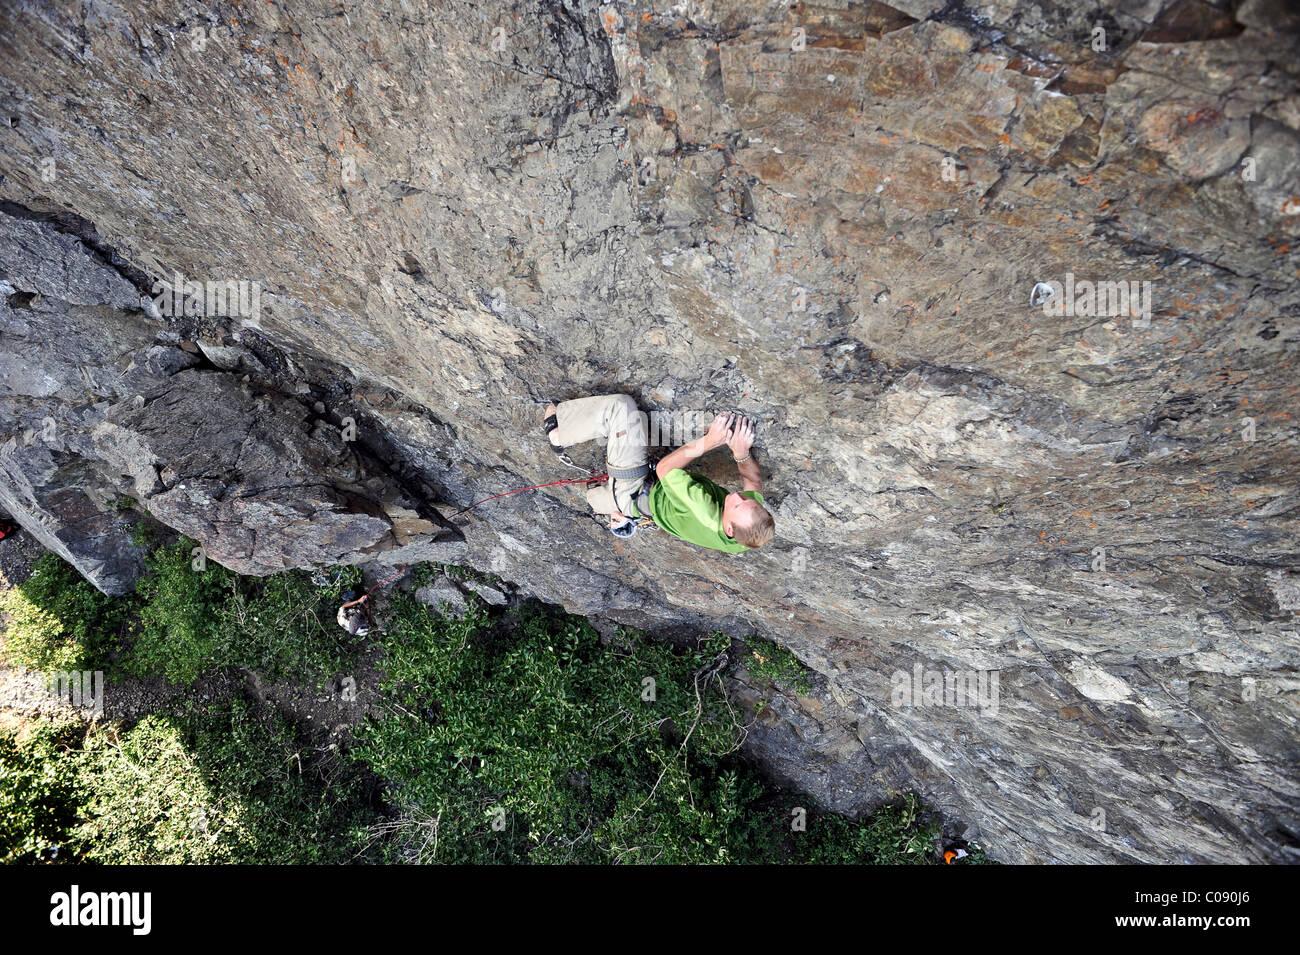 Kletterausrüstung In Der Nähe : Rock climbing equipment stockfotos & bilder